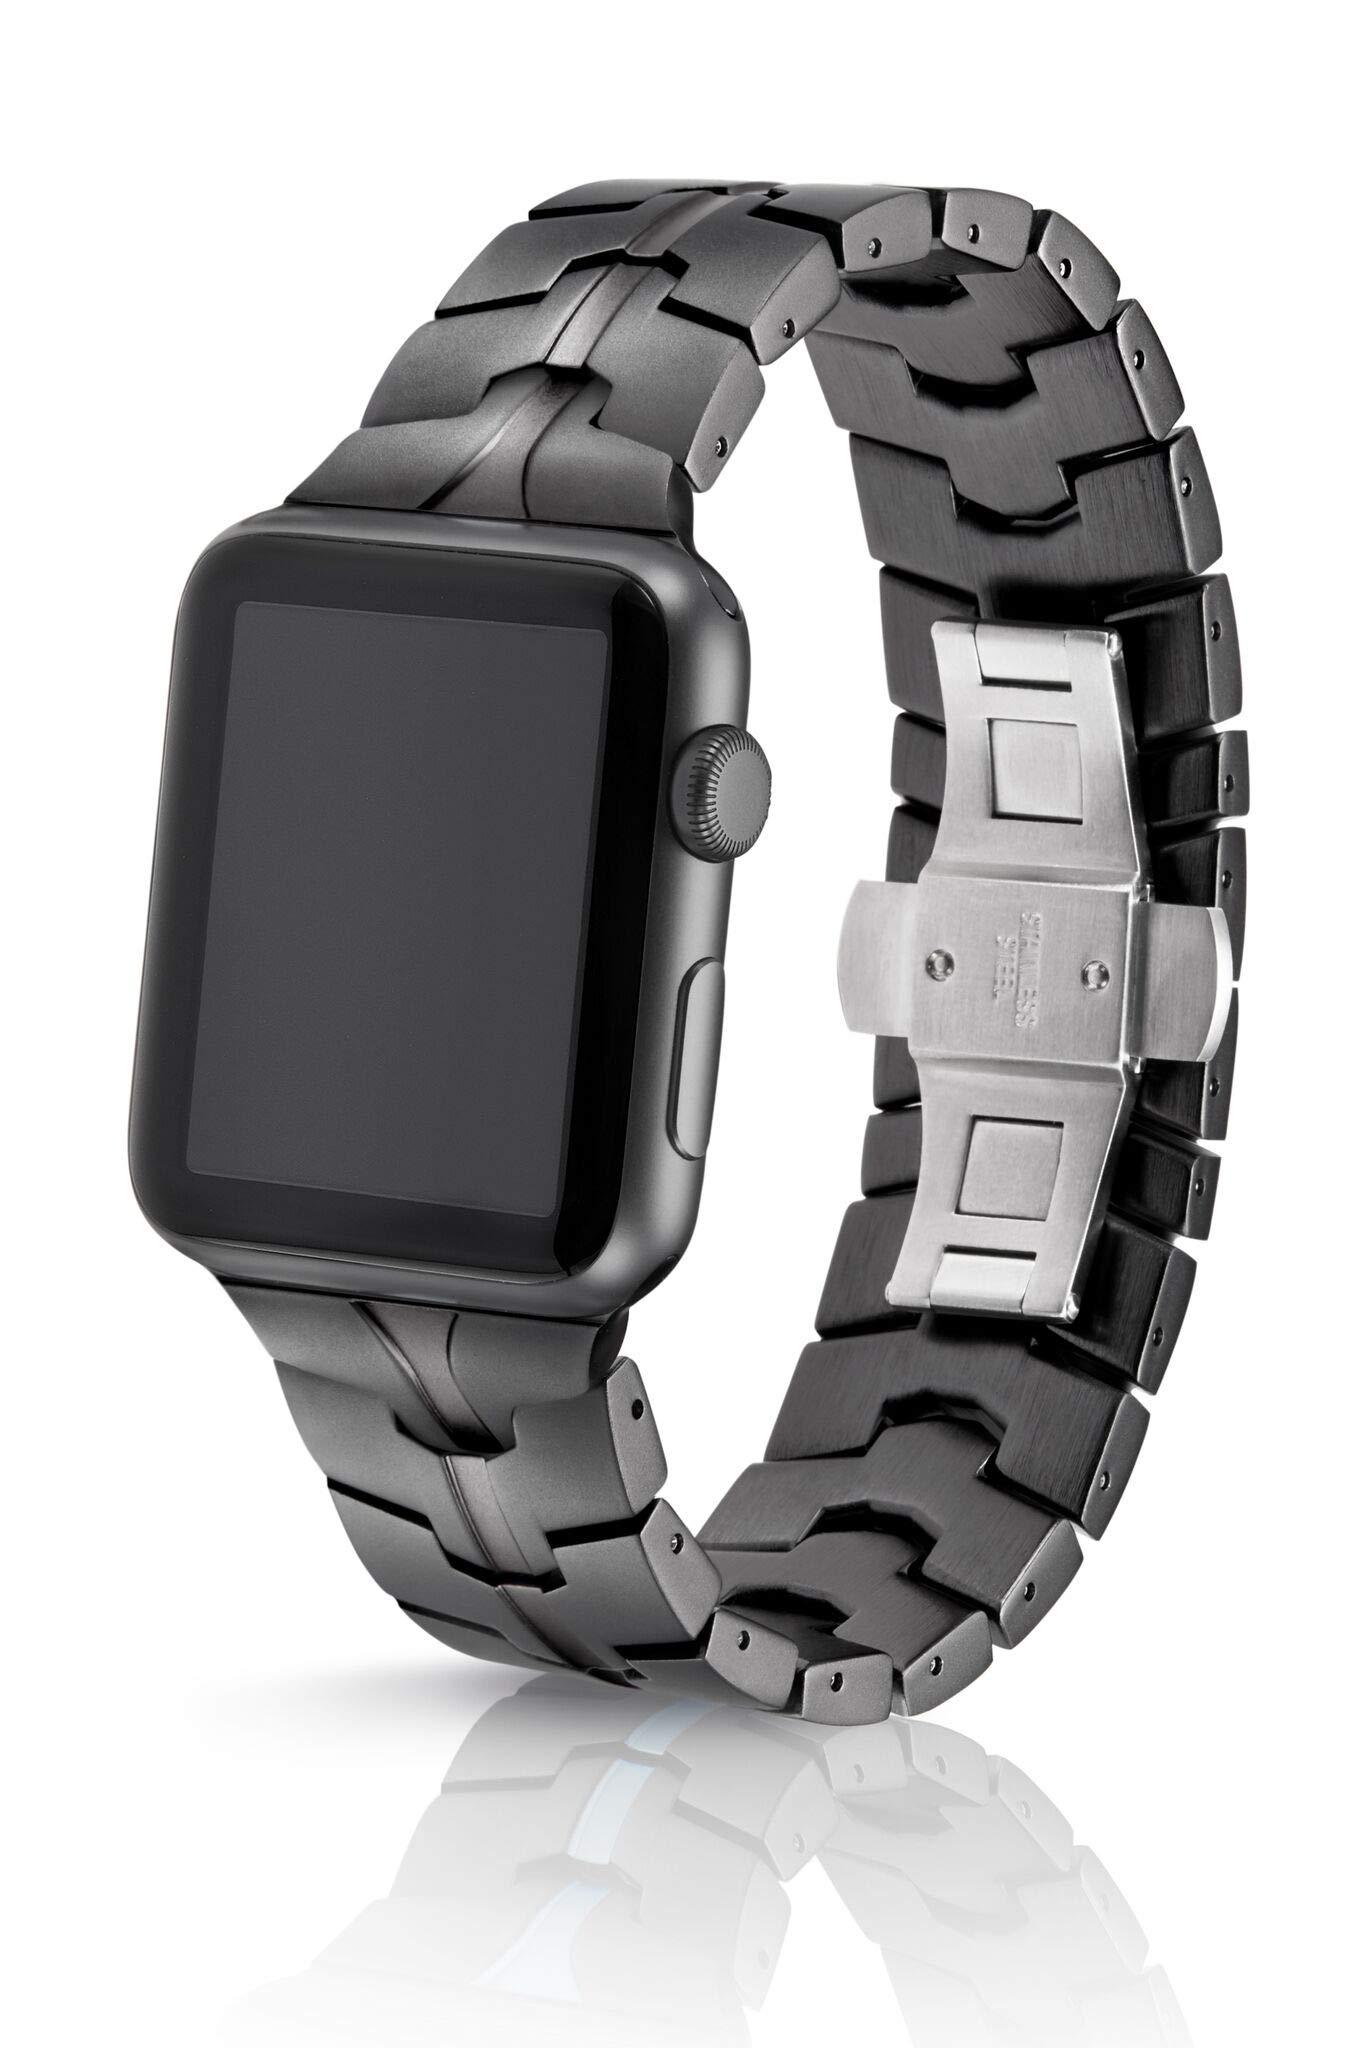 JUUK Design 42mm Vitero Cosmic Grey Band for Apple Watch